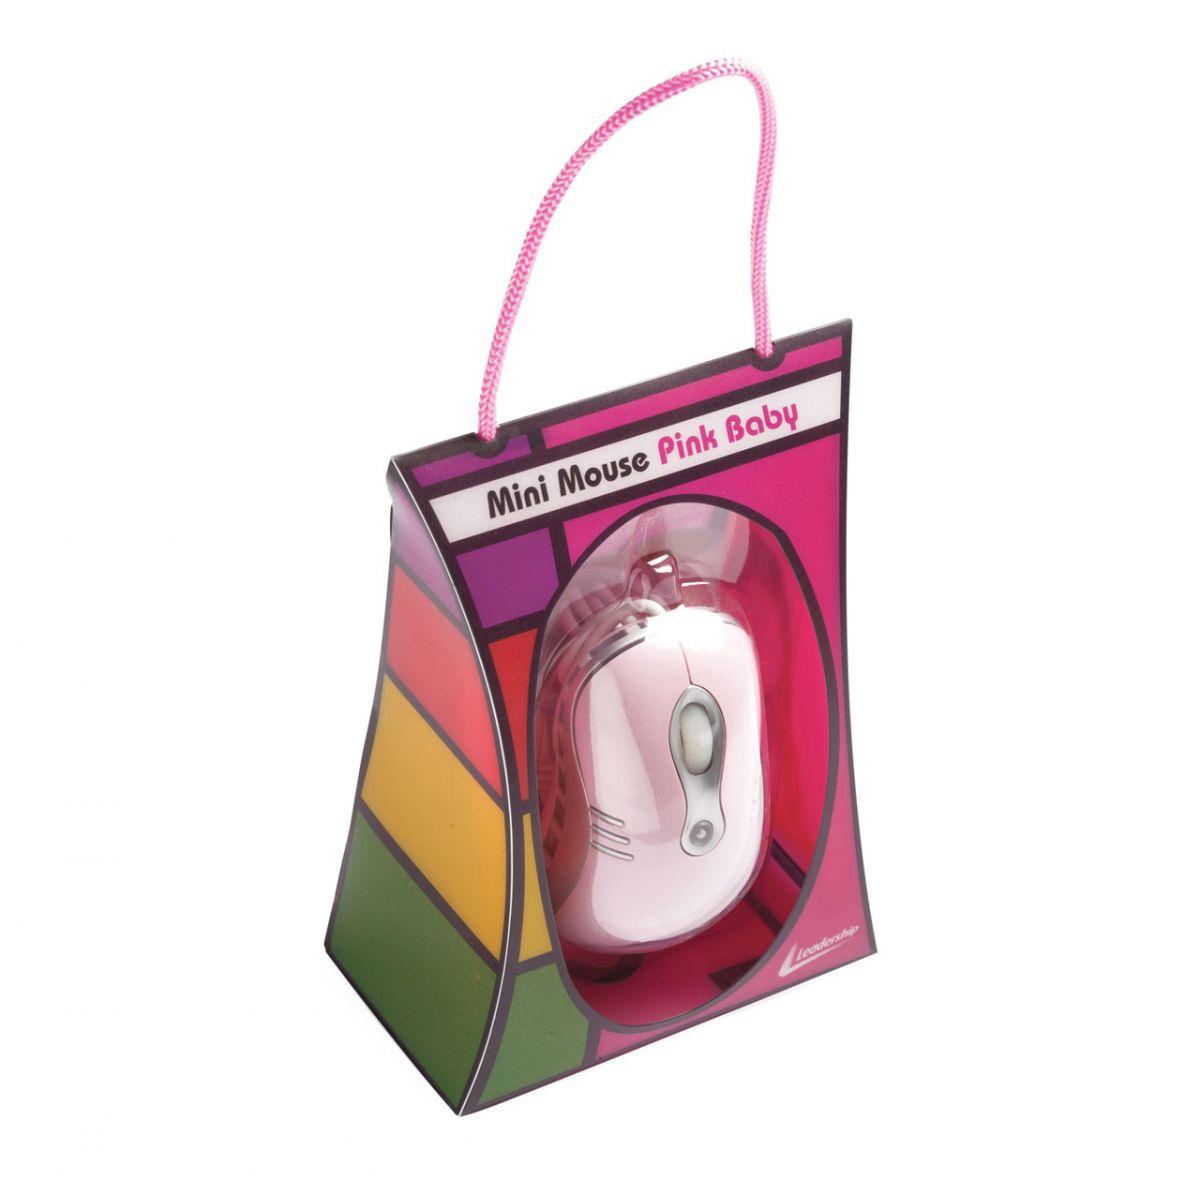 Mini Mouse Pink Baby Usb 3447 - Leadership